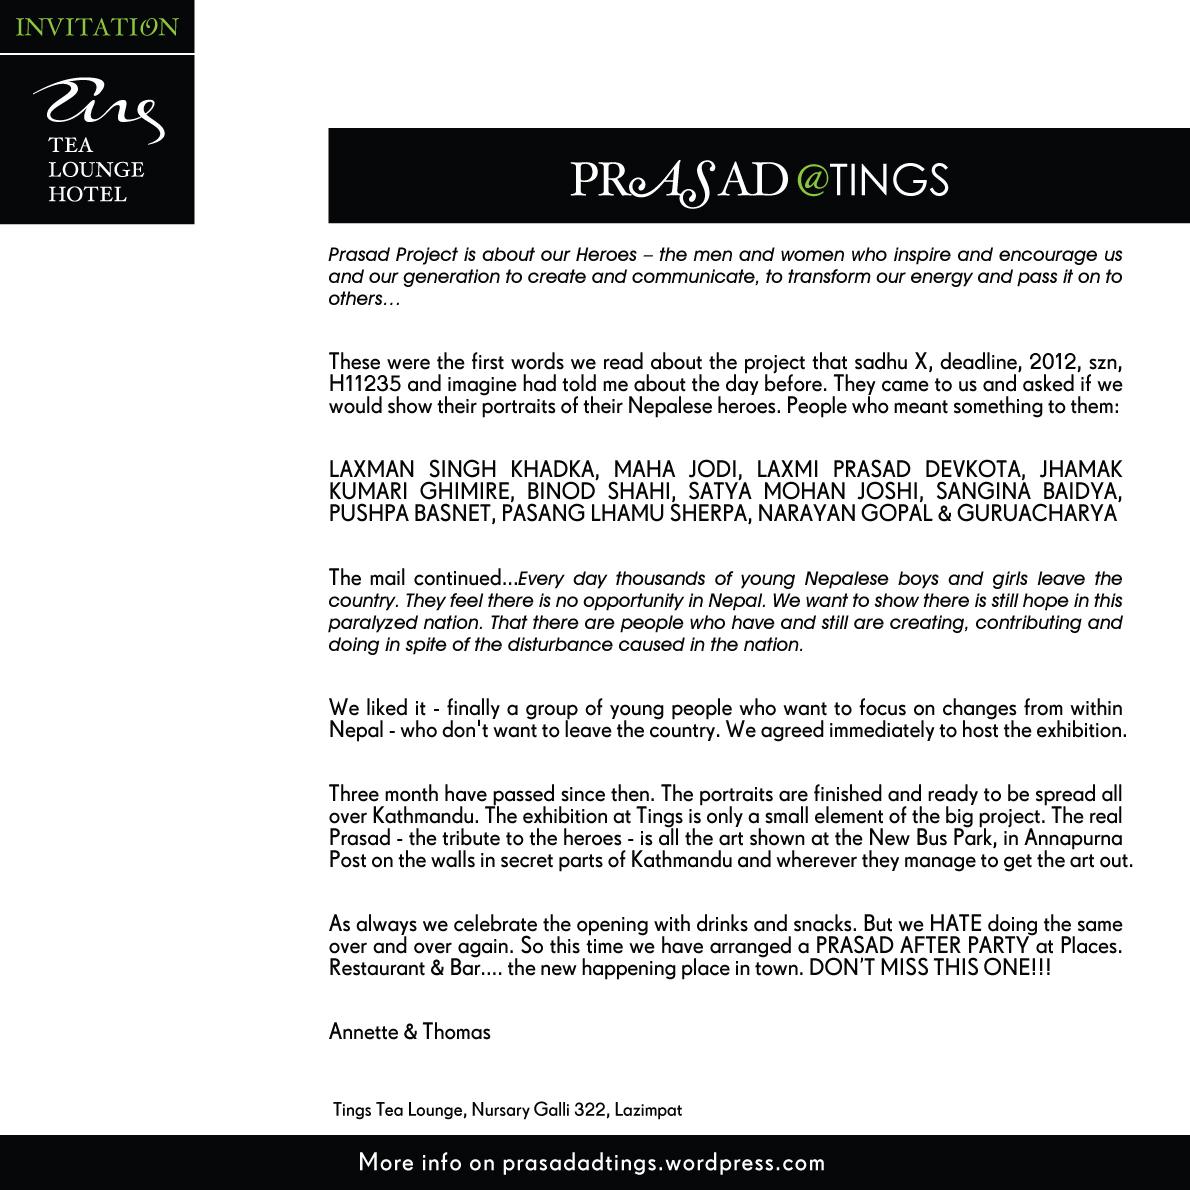 Prasad-@tings-(Street-art-)-invitation-back FINAL)